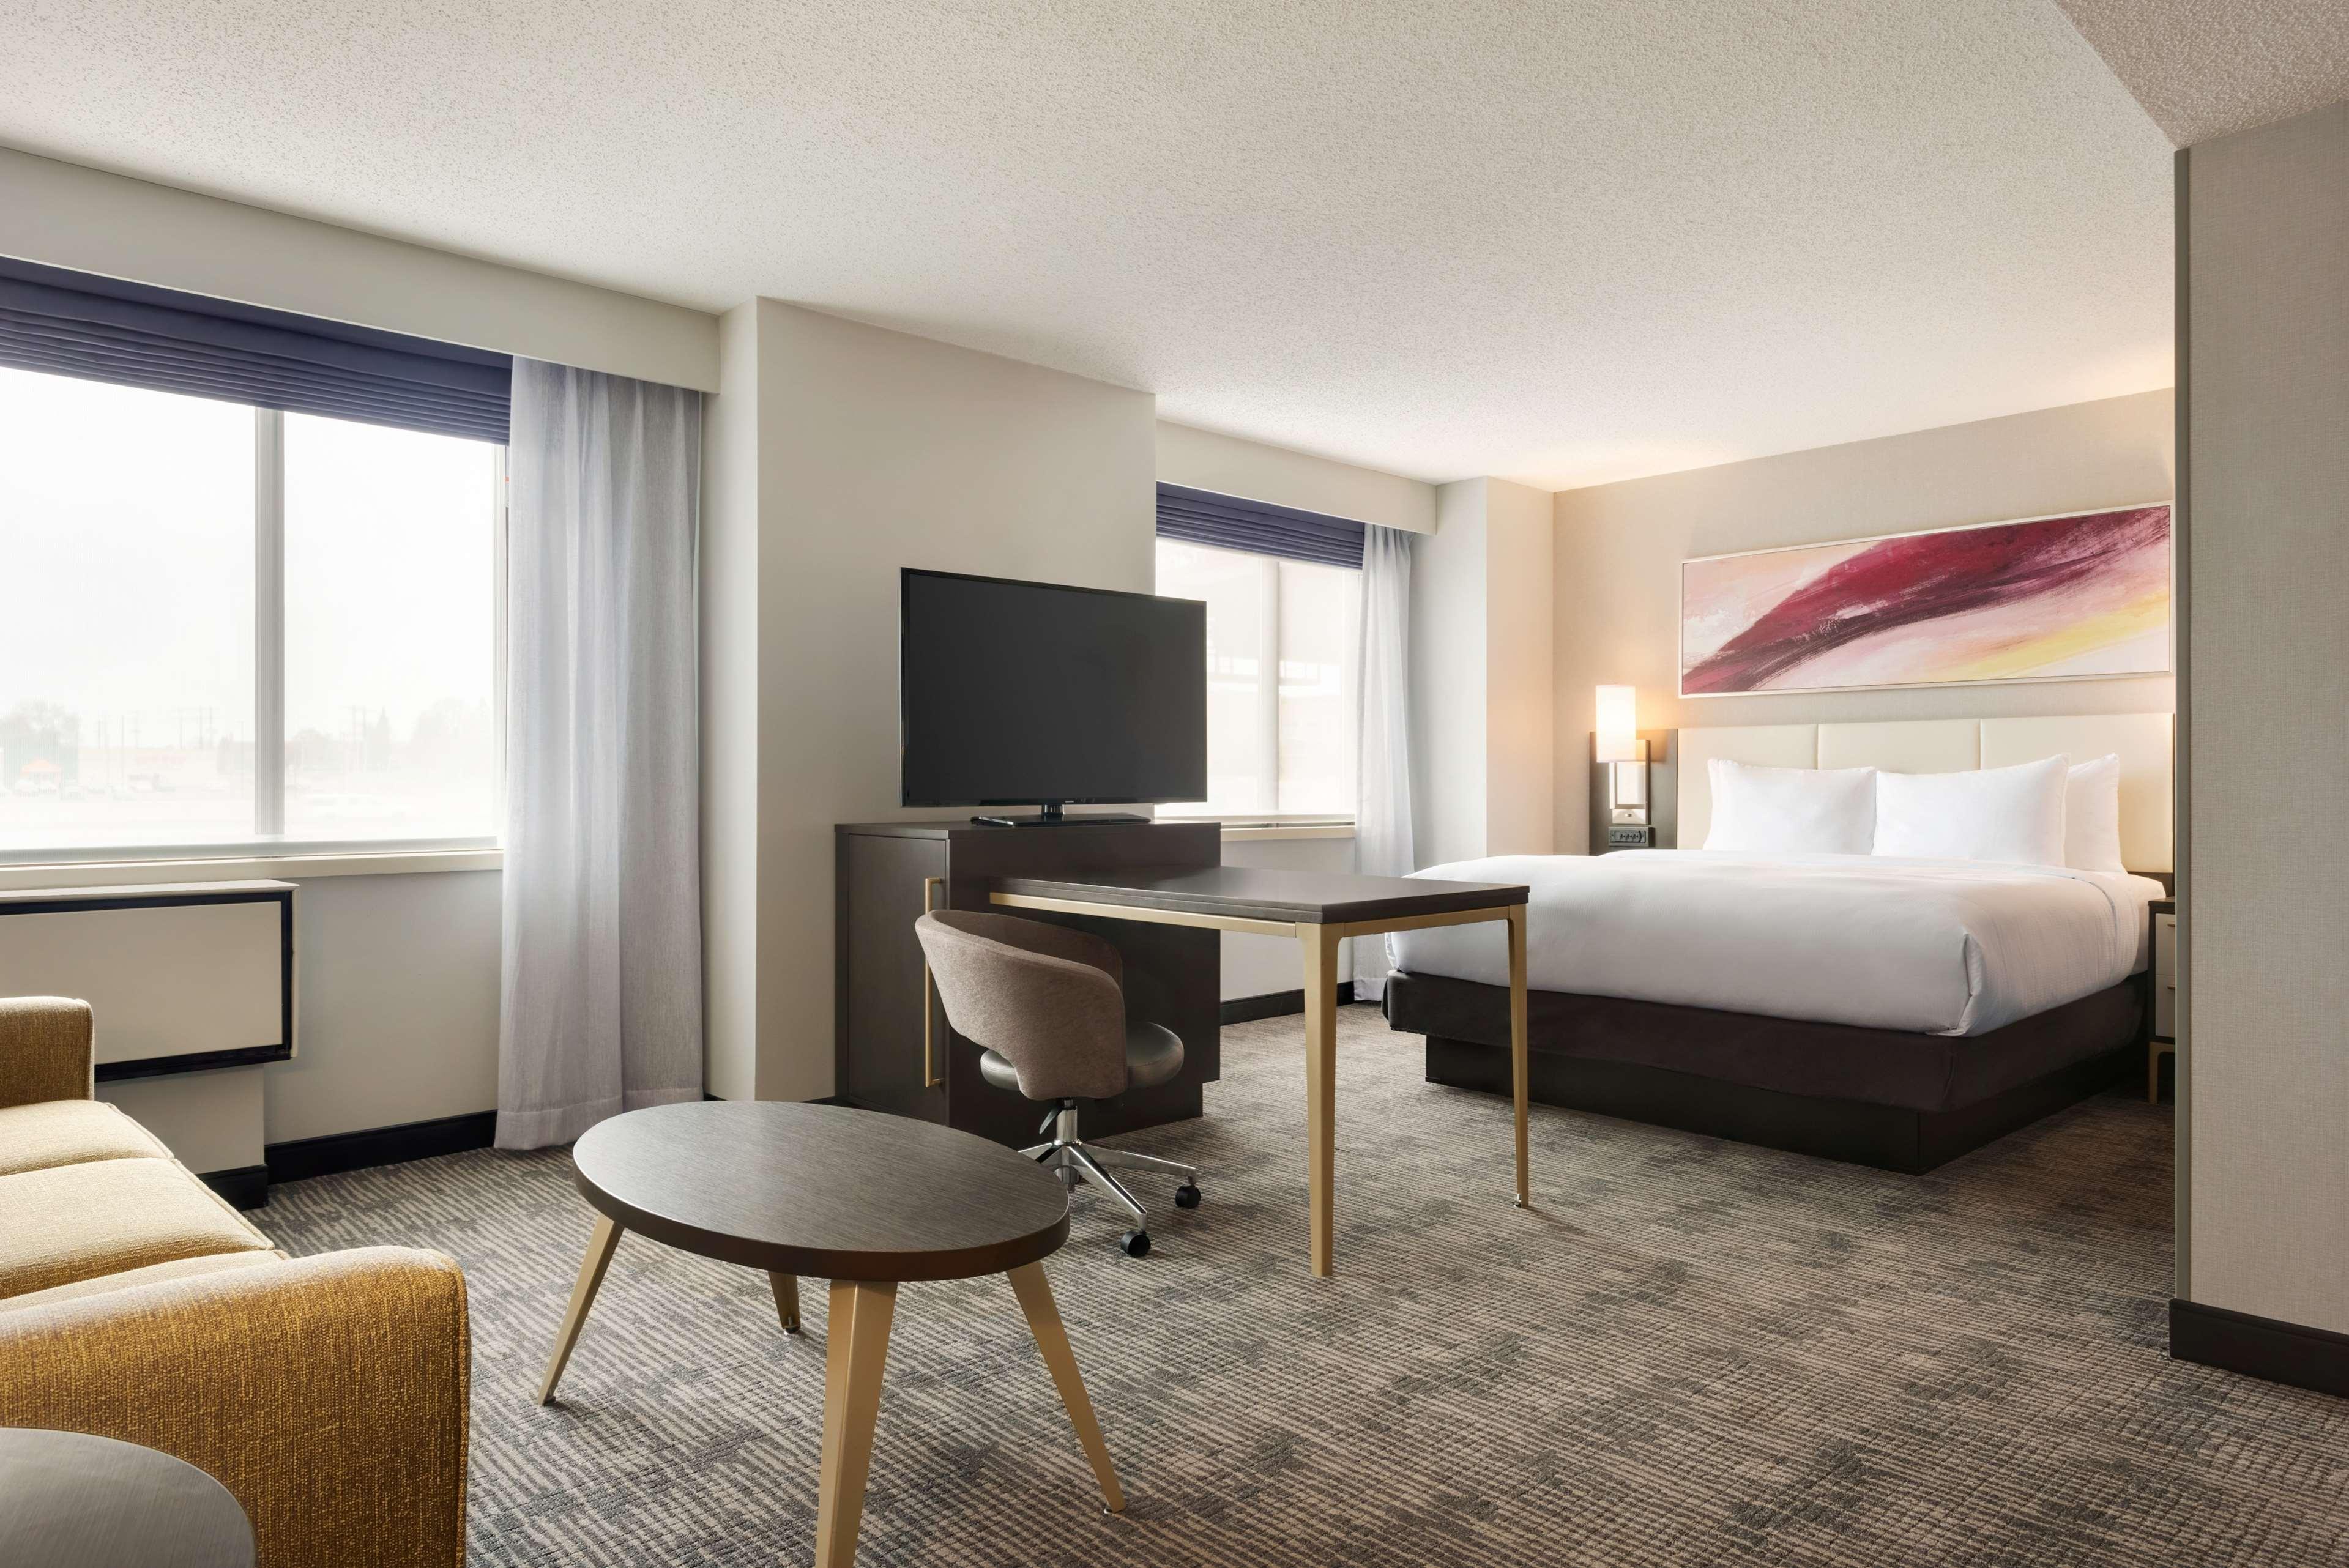 DoubleTree by Hilton St. Paul East image 19